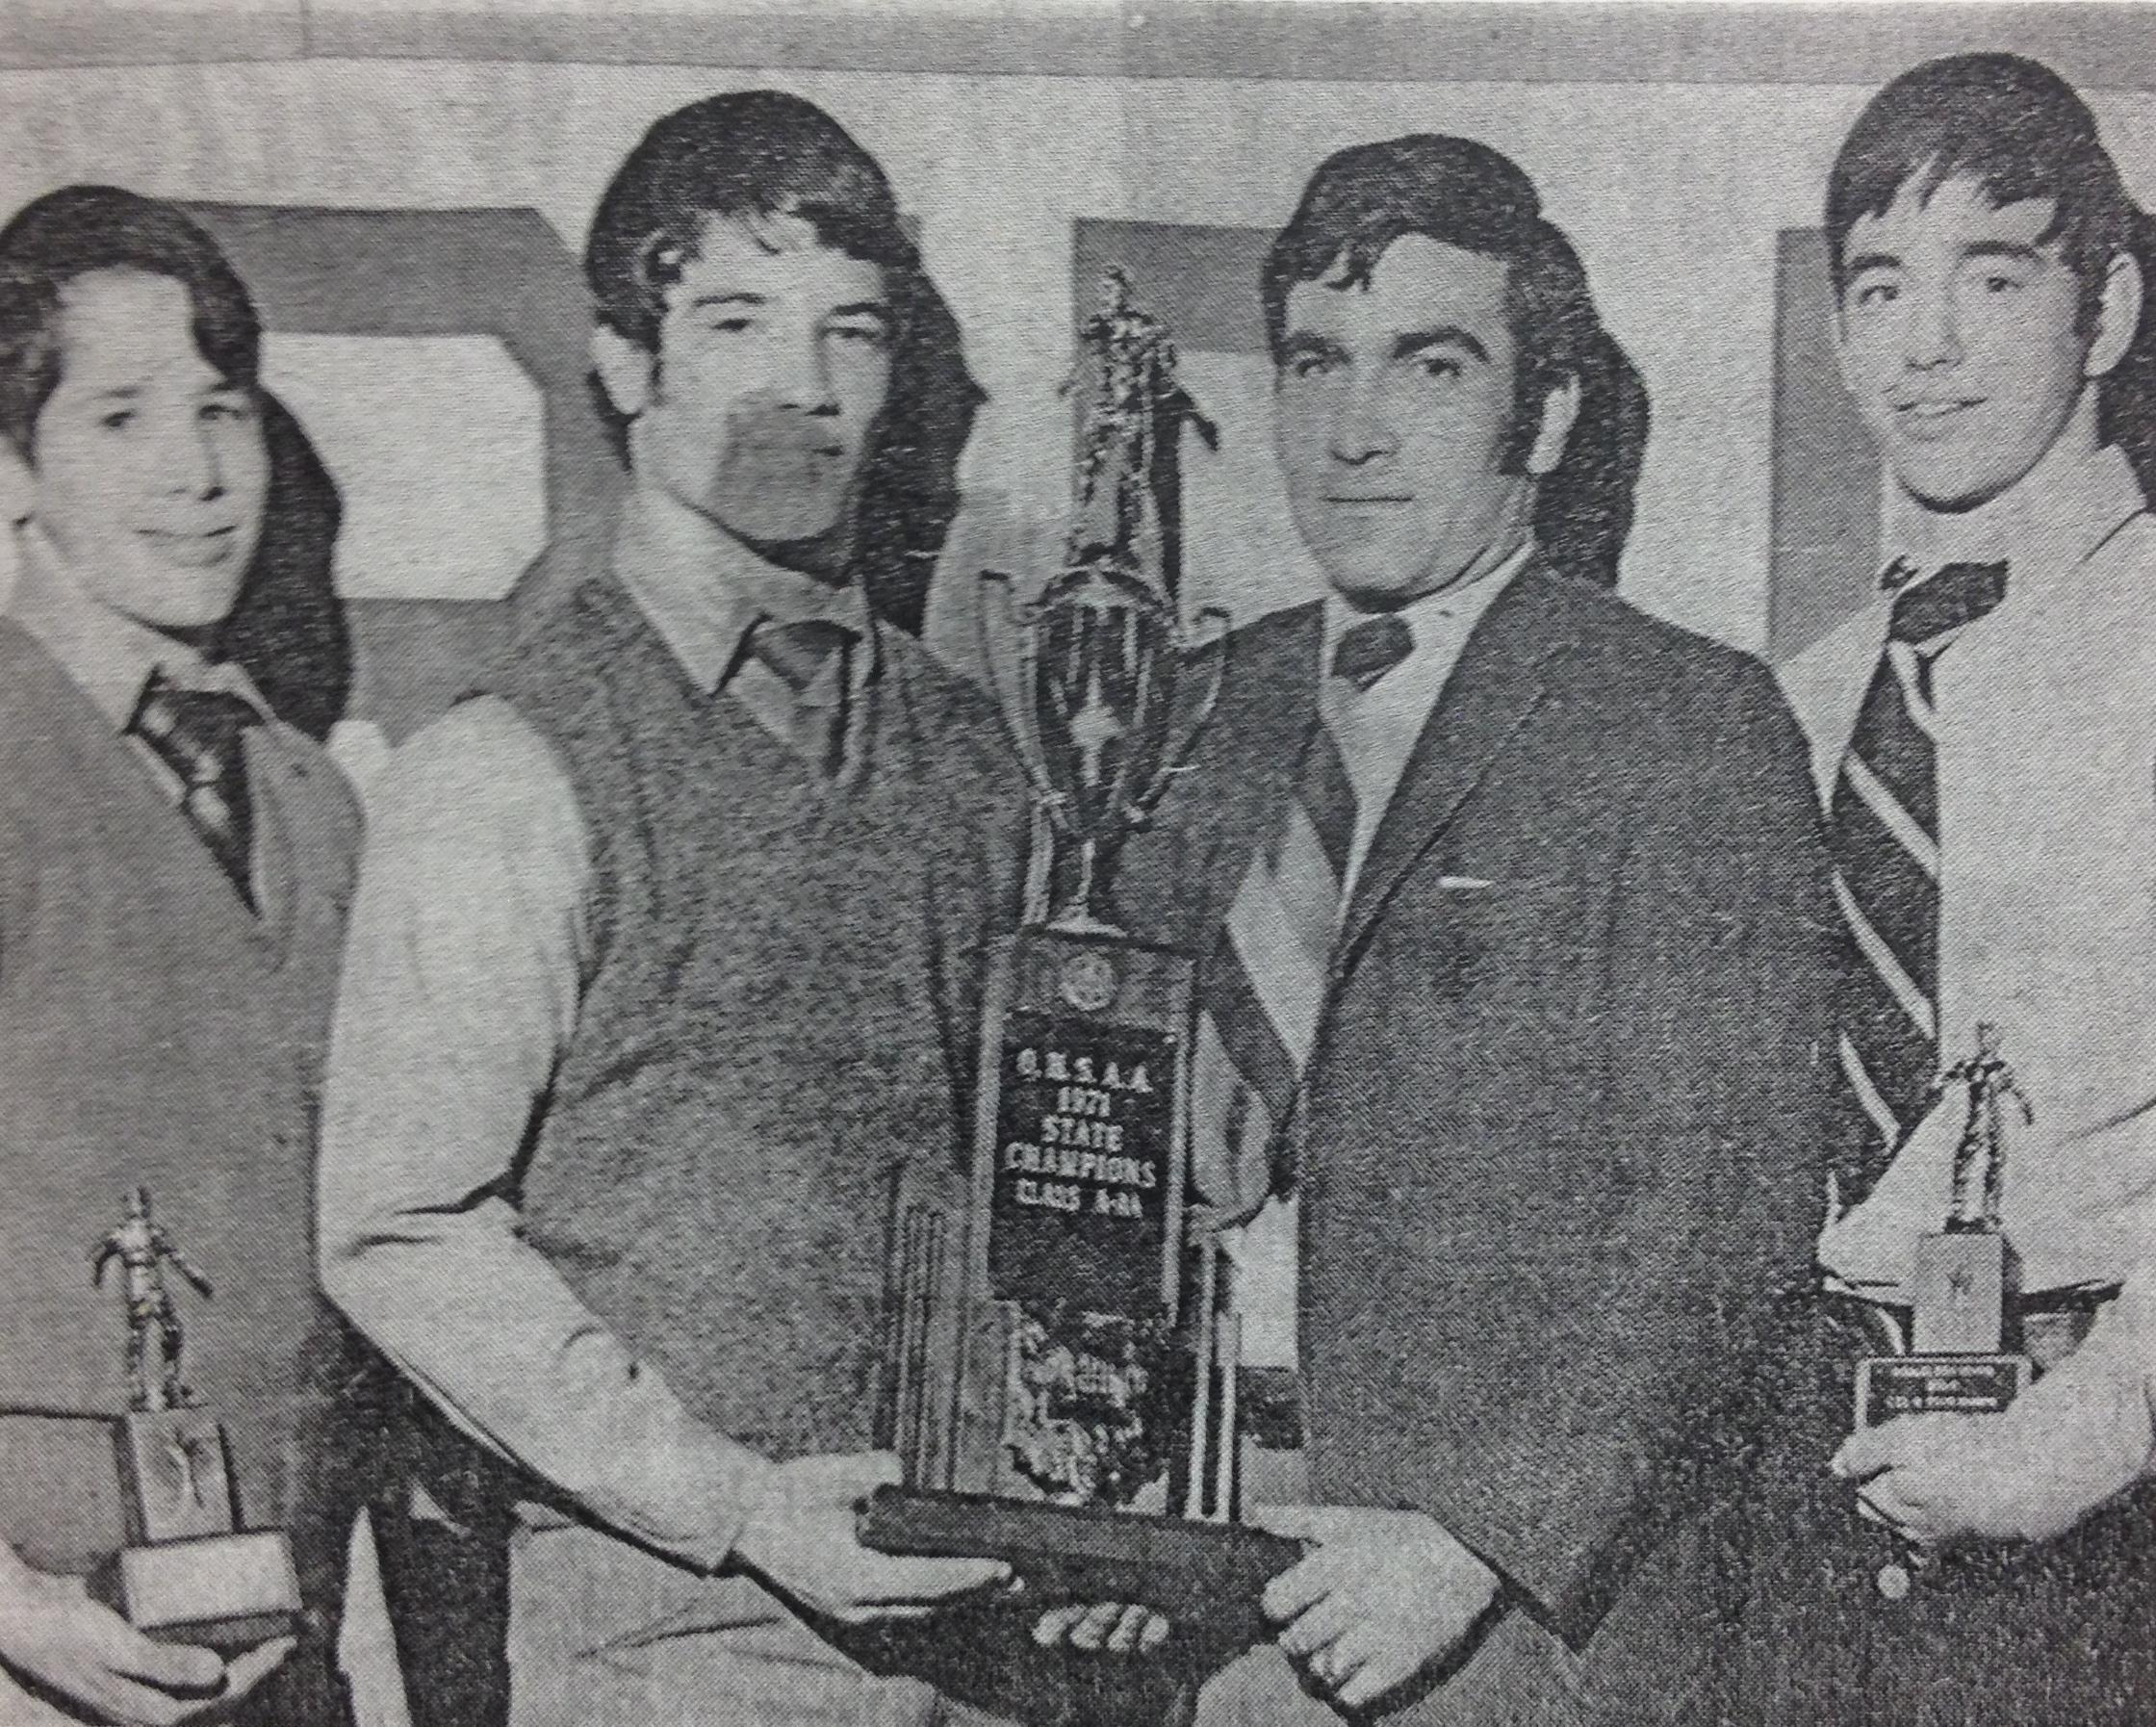 Tom Bauer, Tim Wilson, Bob Triano and Joe Gordon